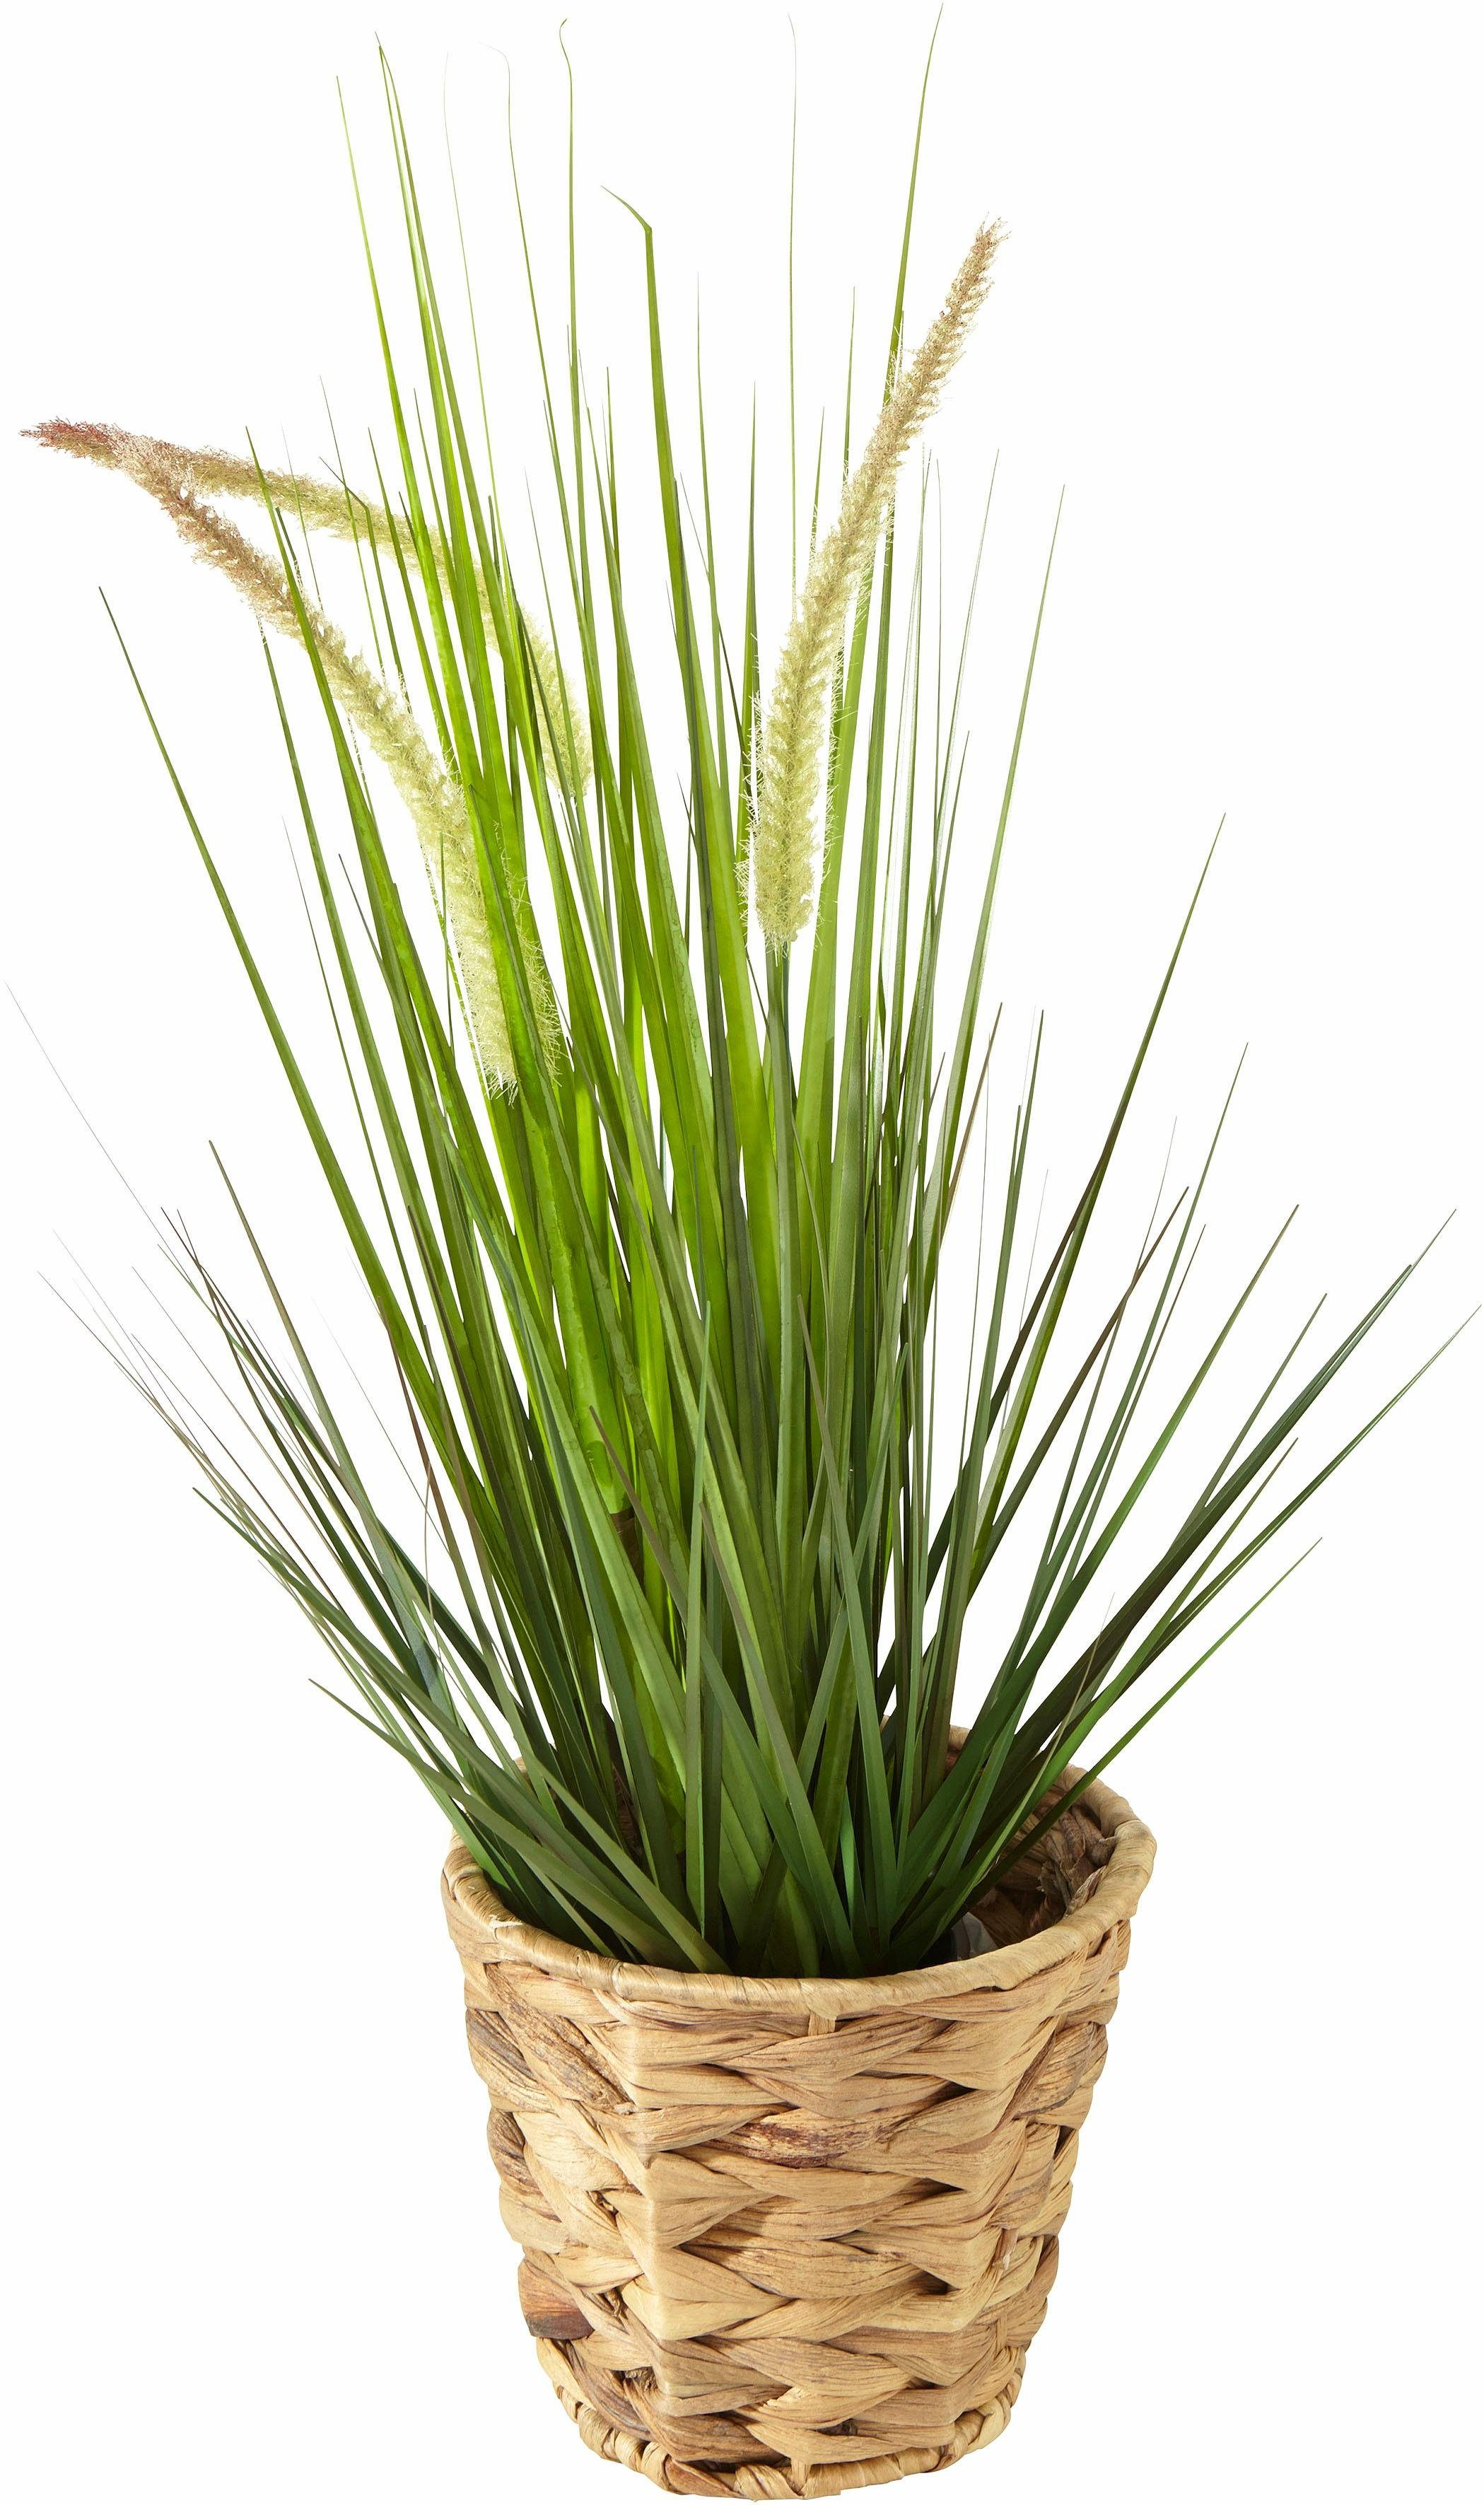 Home affaire Kunstpflanze »Gras« im Kunststofftopf